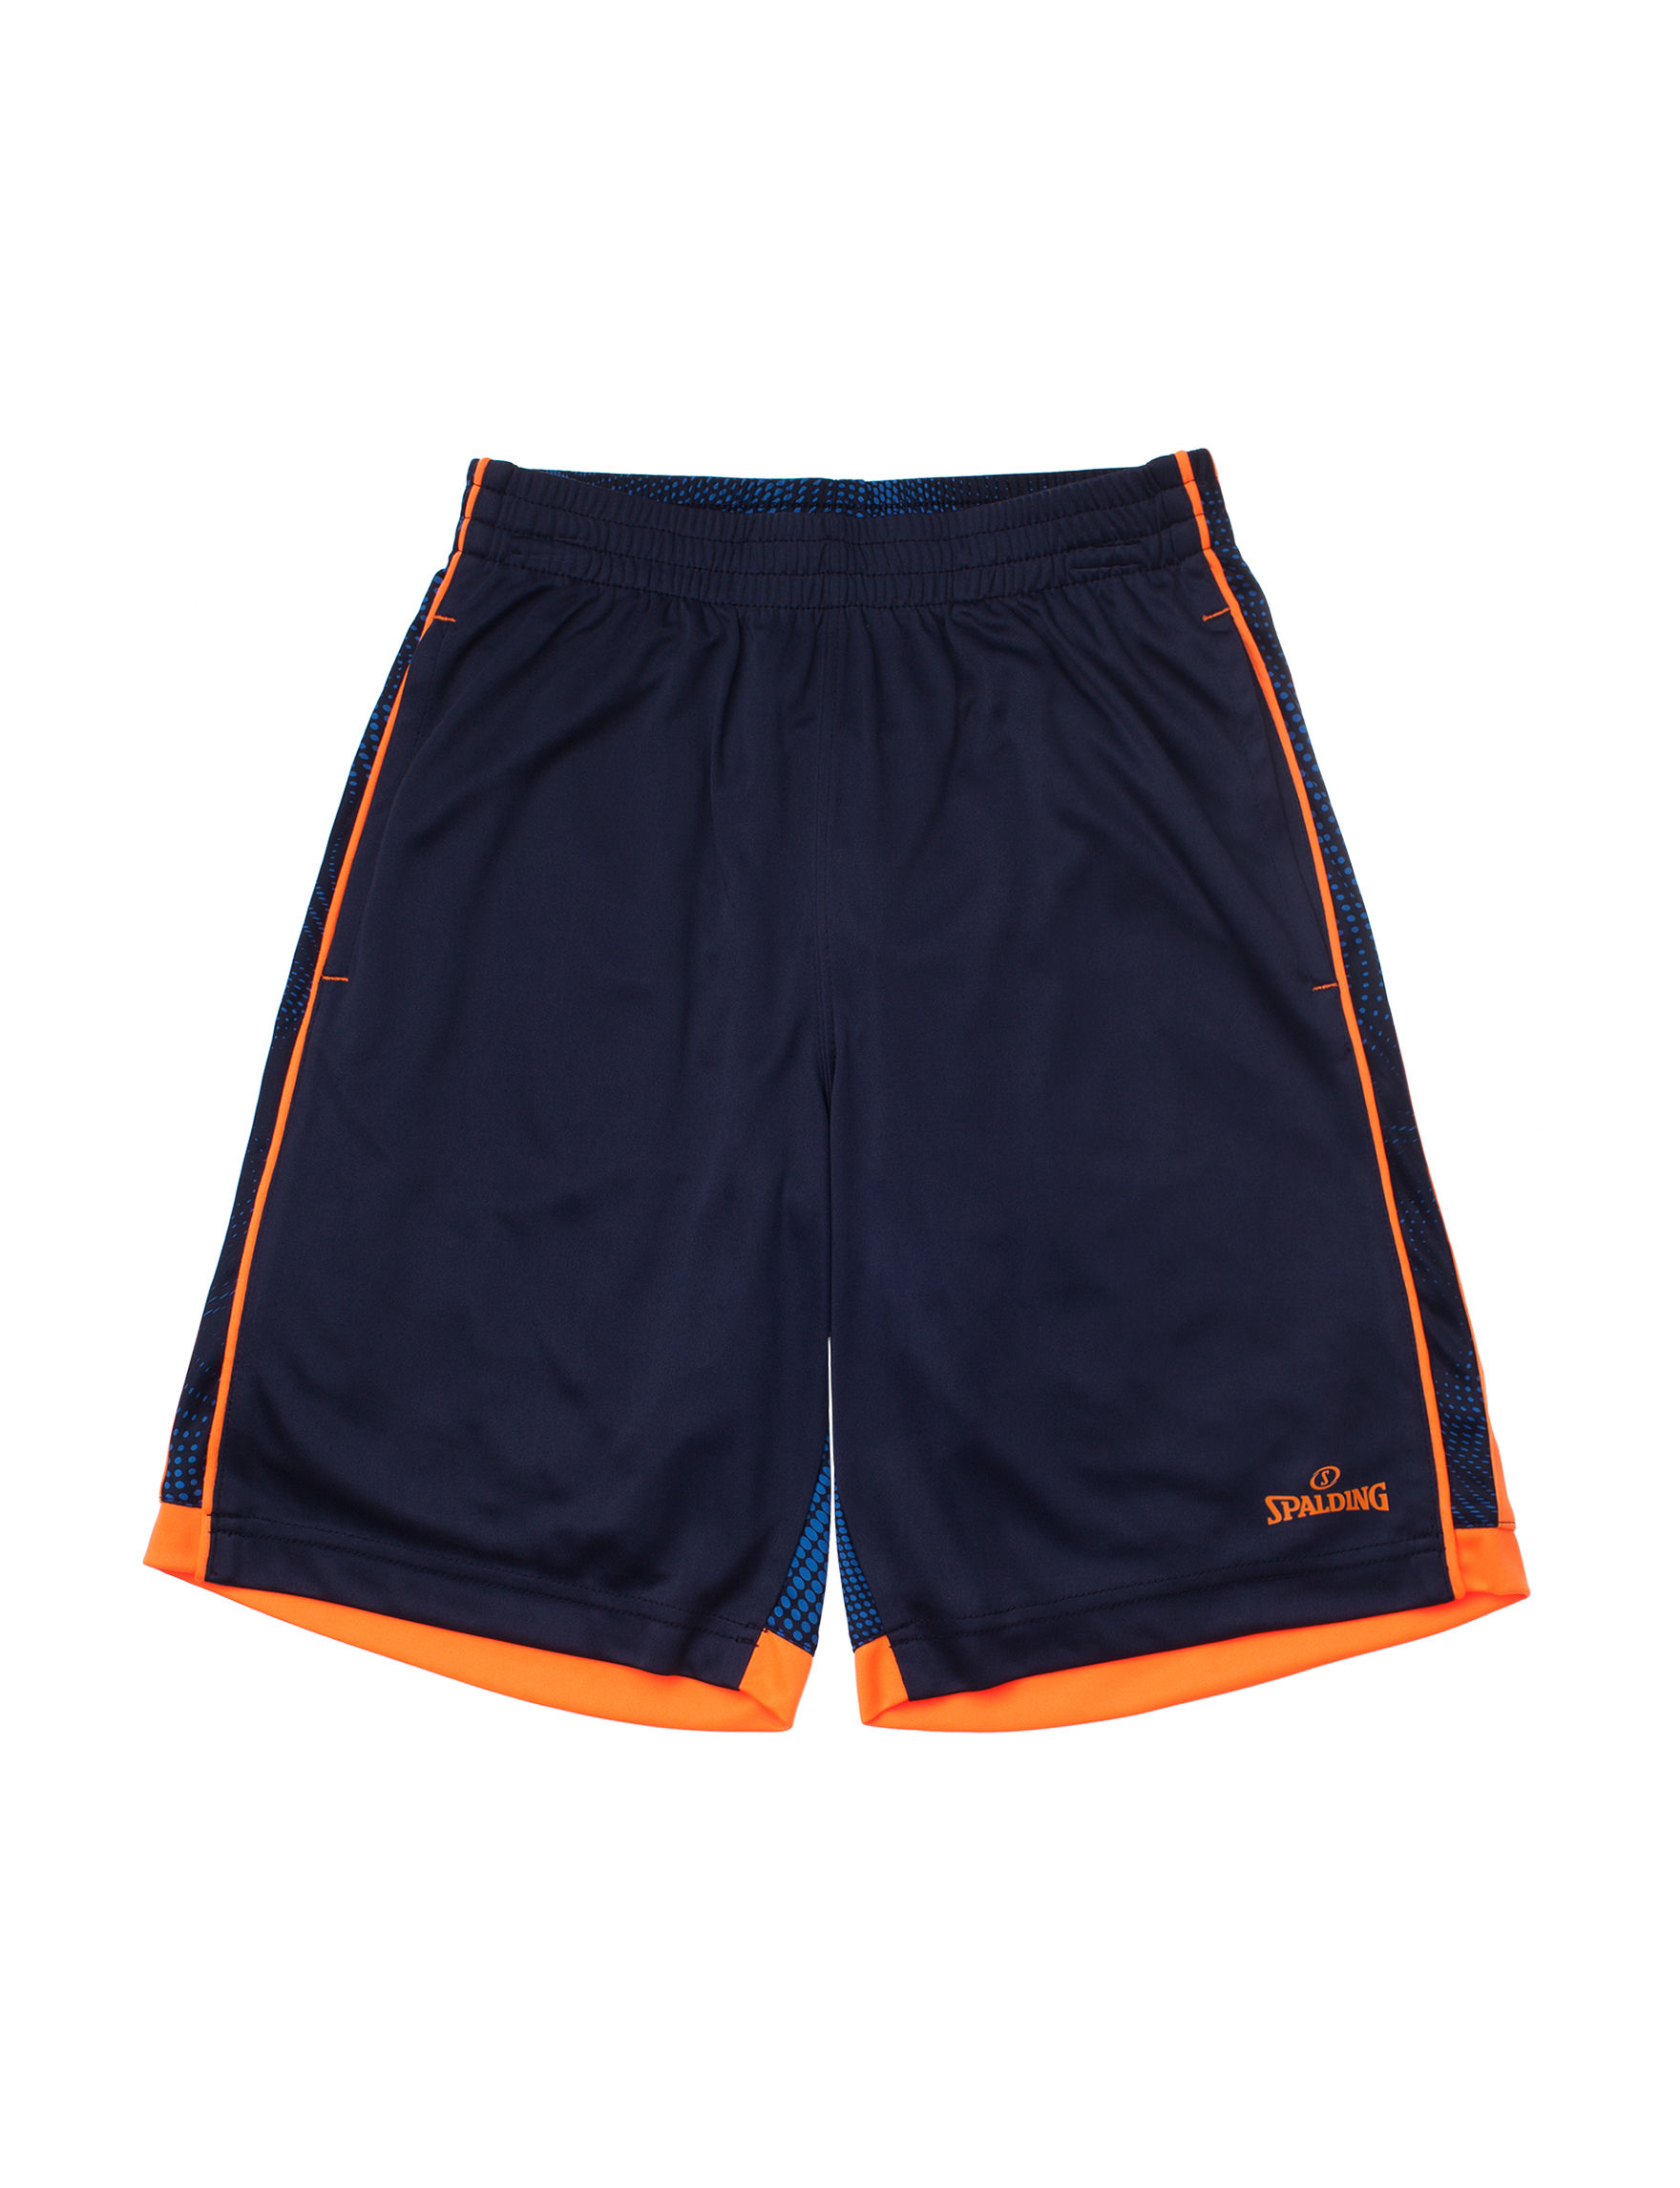 Spalding Navy / Orange Relaxed